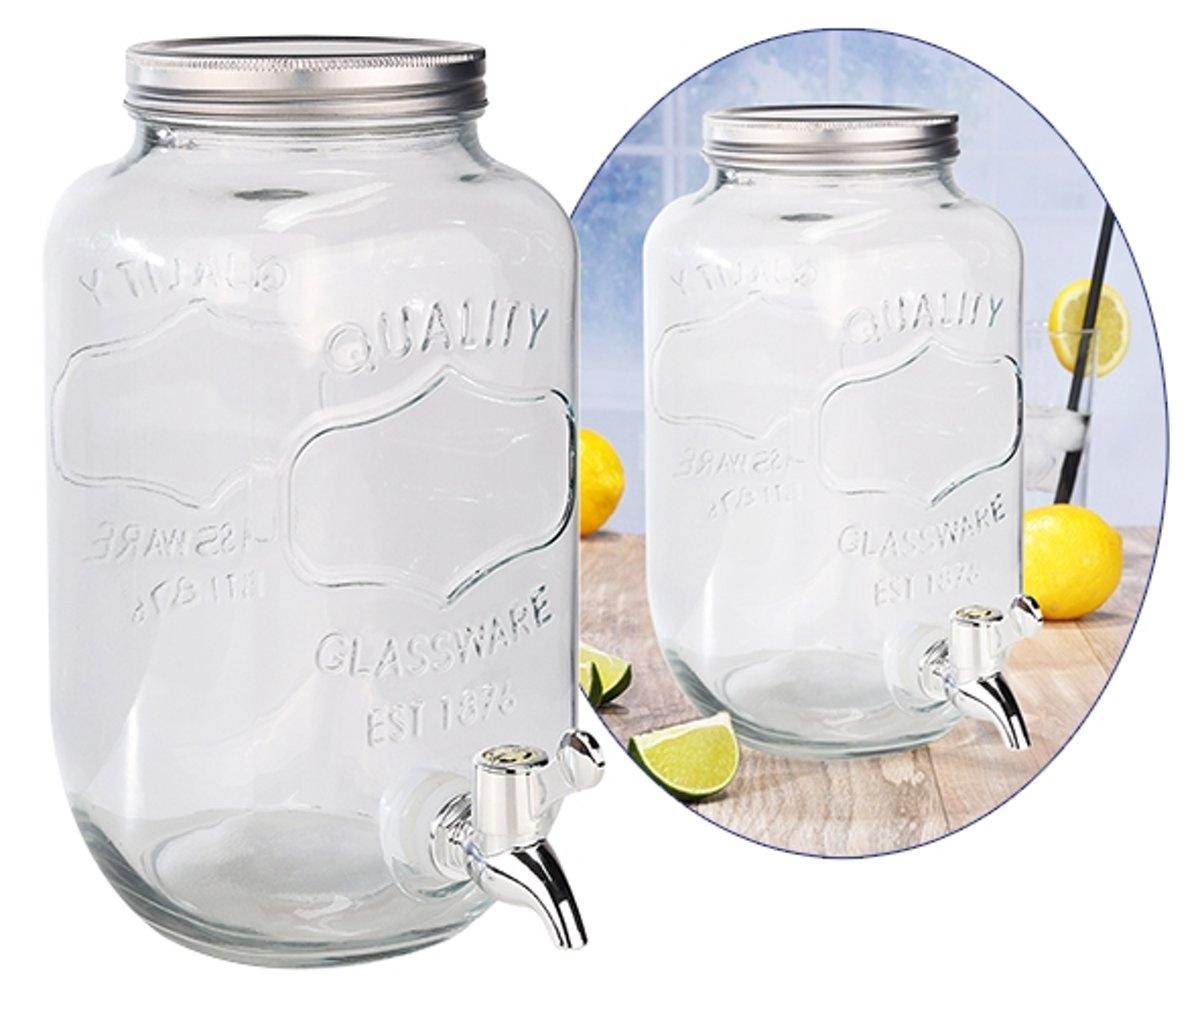 Haushalt Haushalt 13083 - Waterkaraf 3 liter - drankautomaat